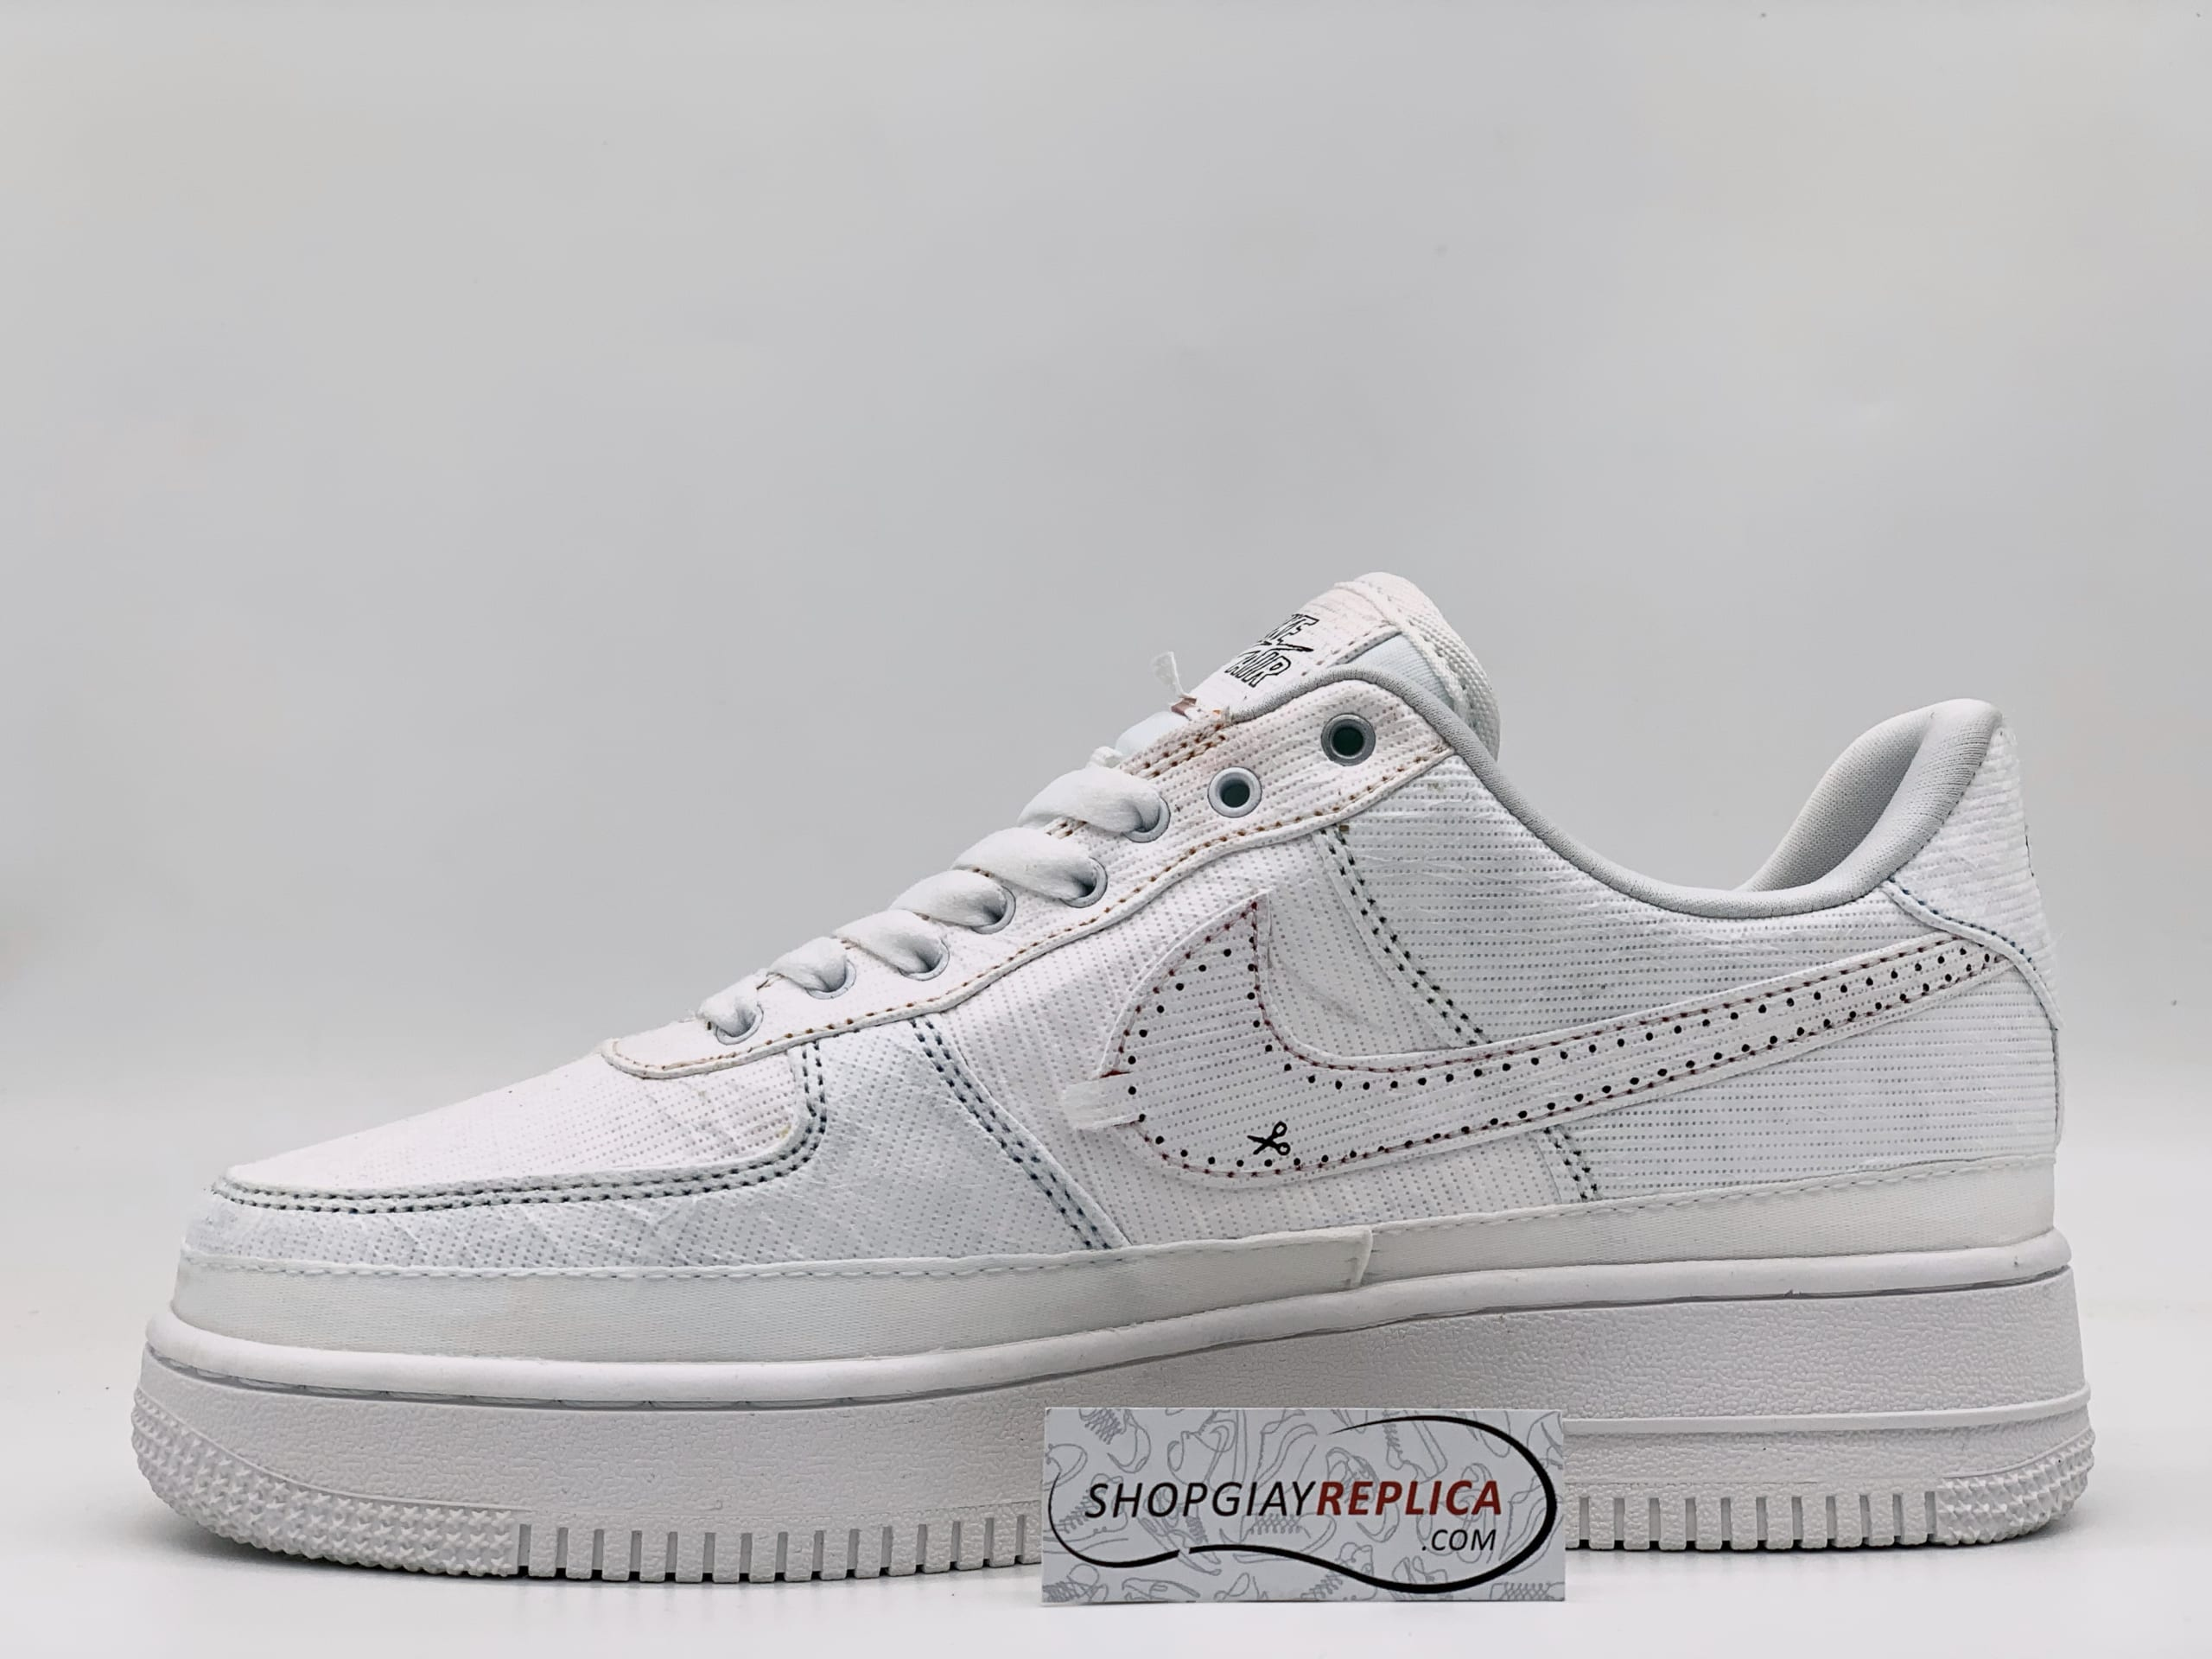 Giày Nike Tear Away xé rách